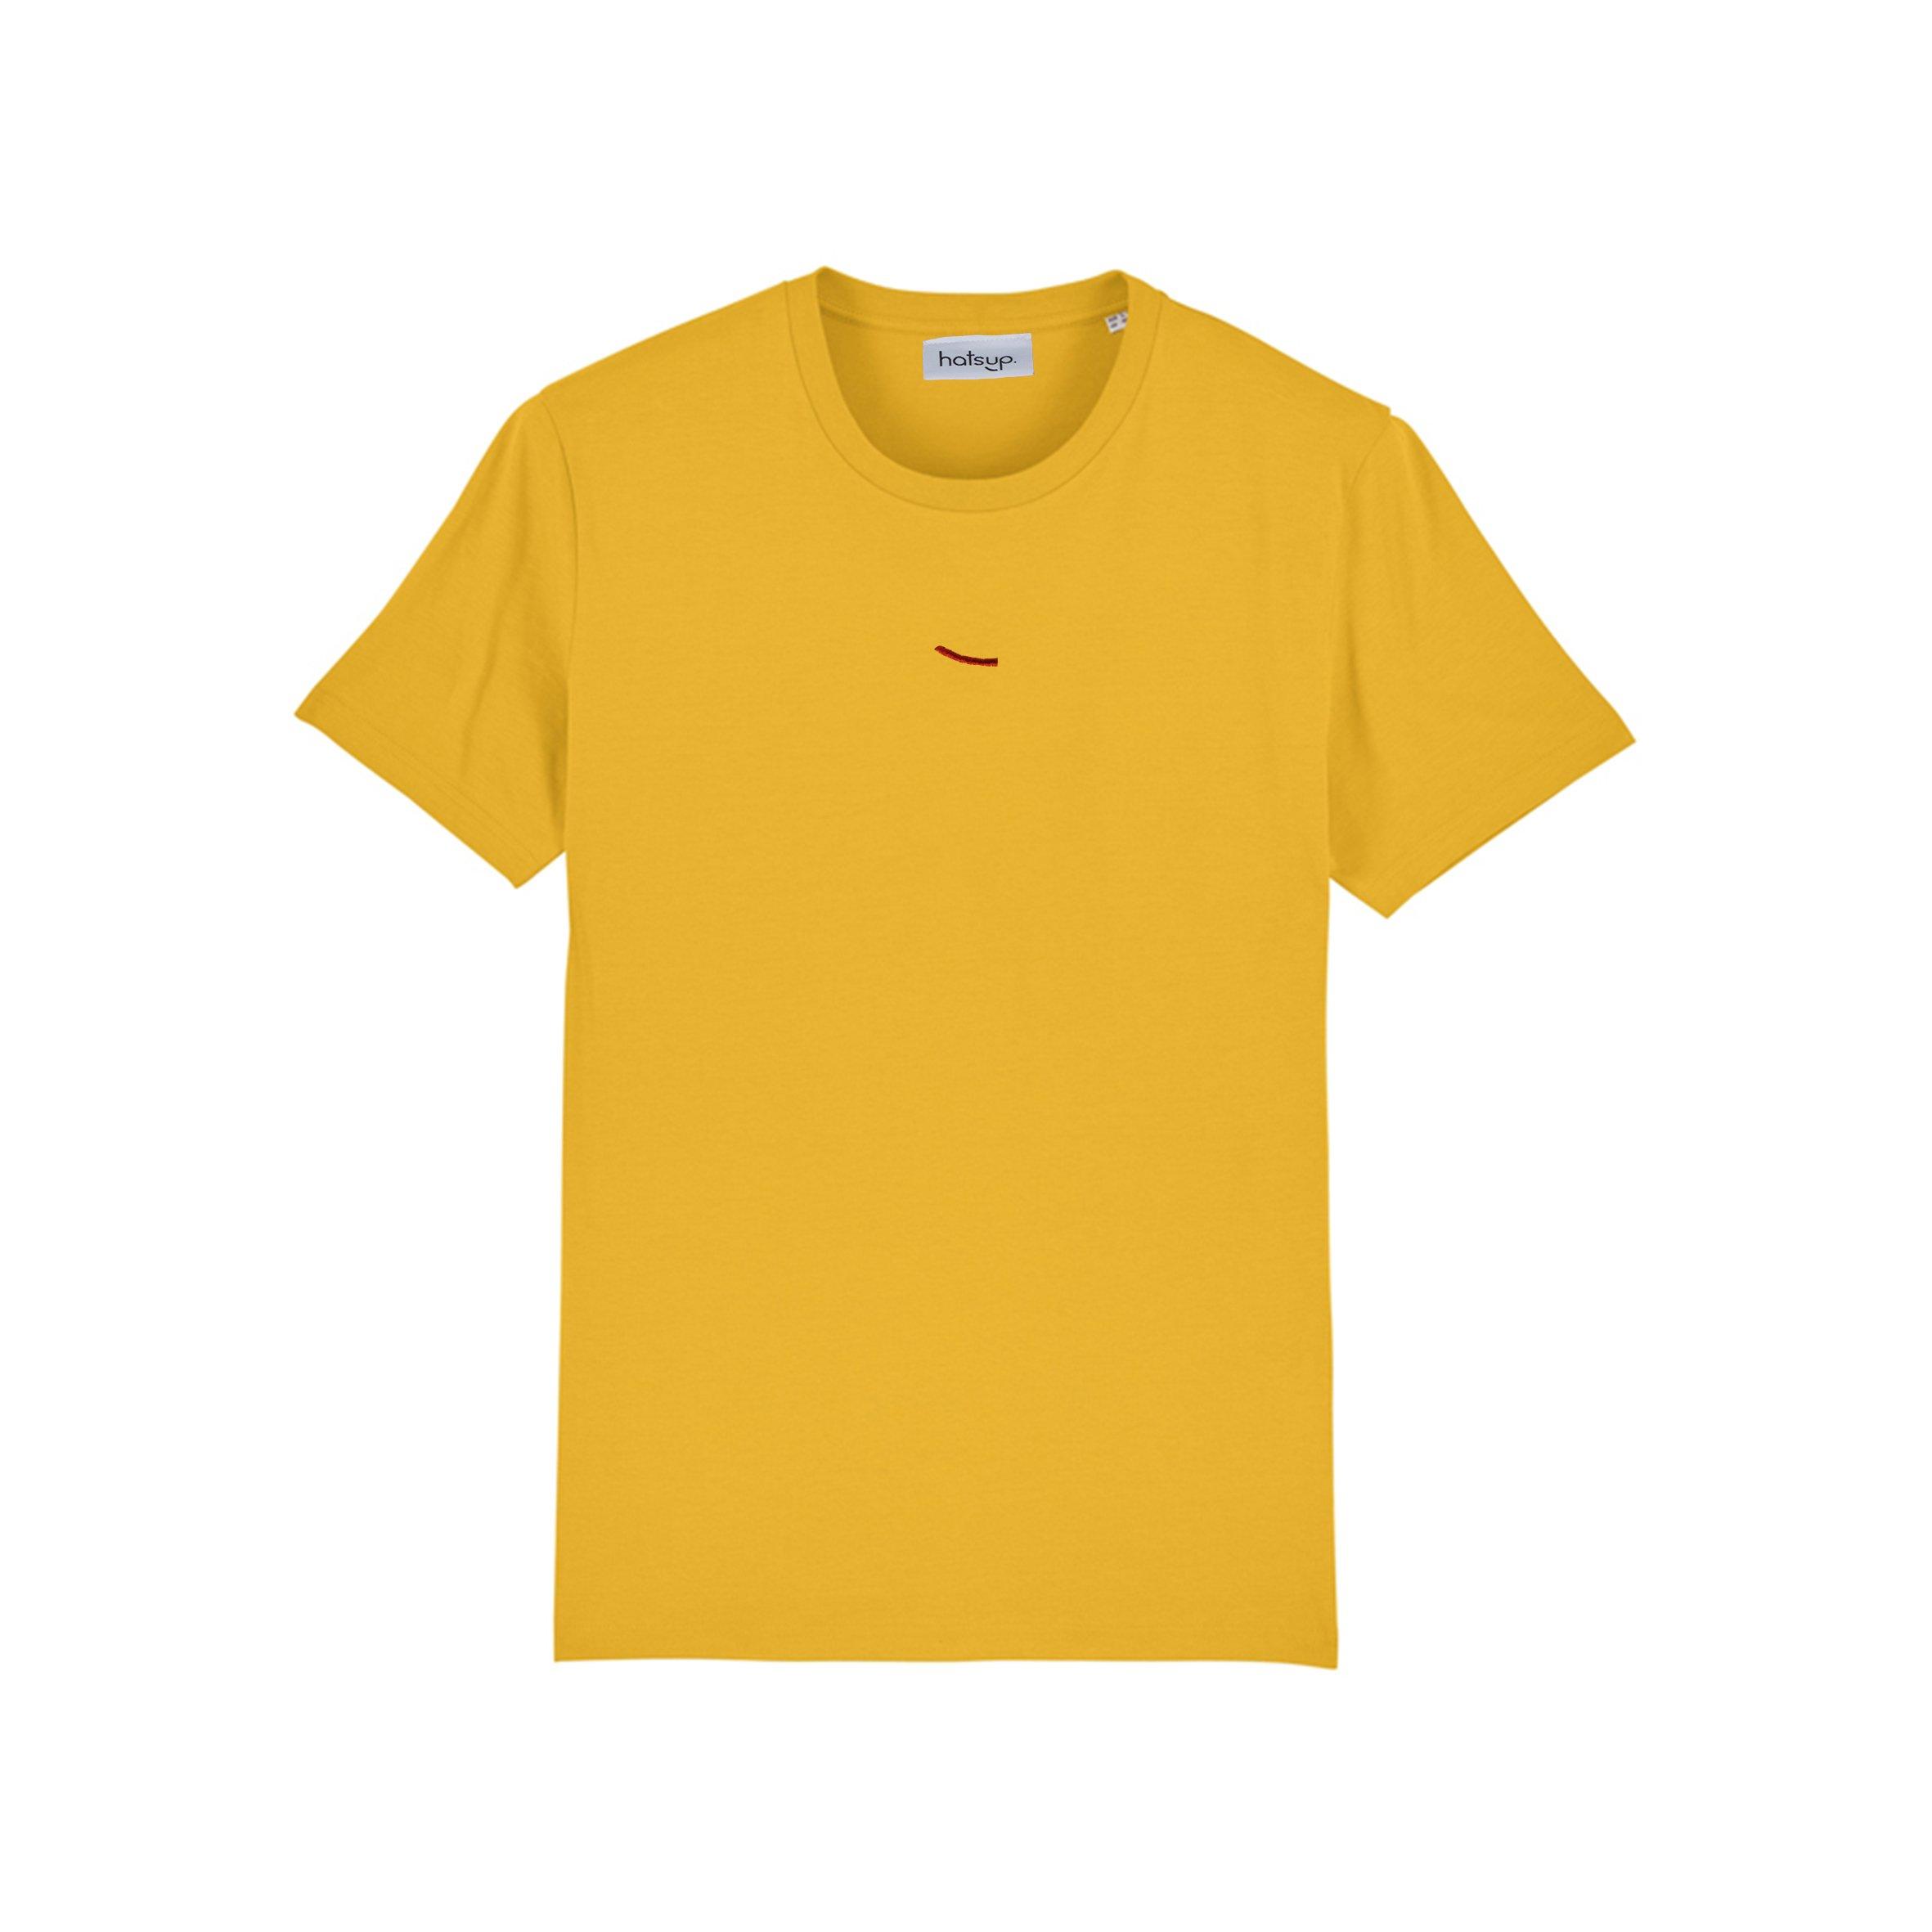 T-shirt Bangui yellow from hatsup